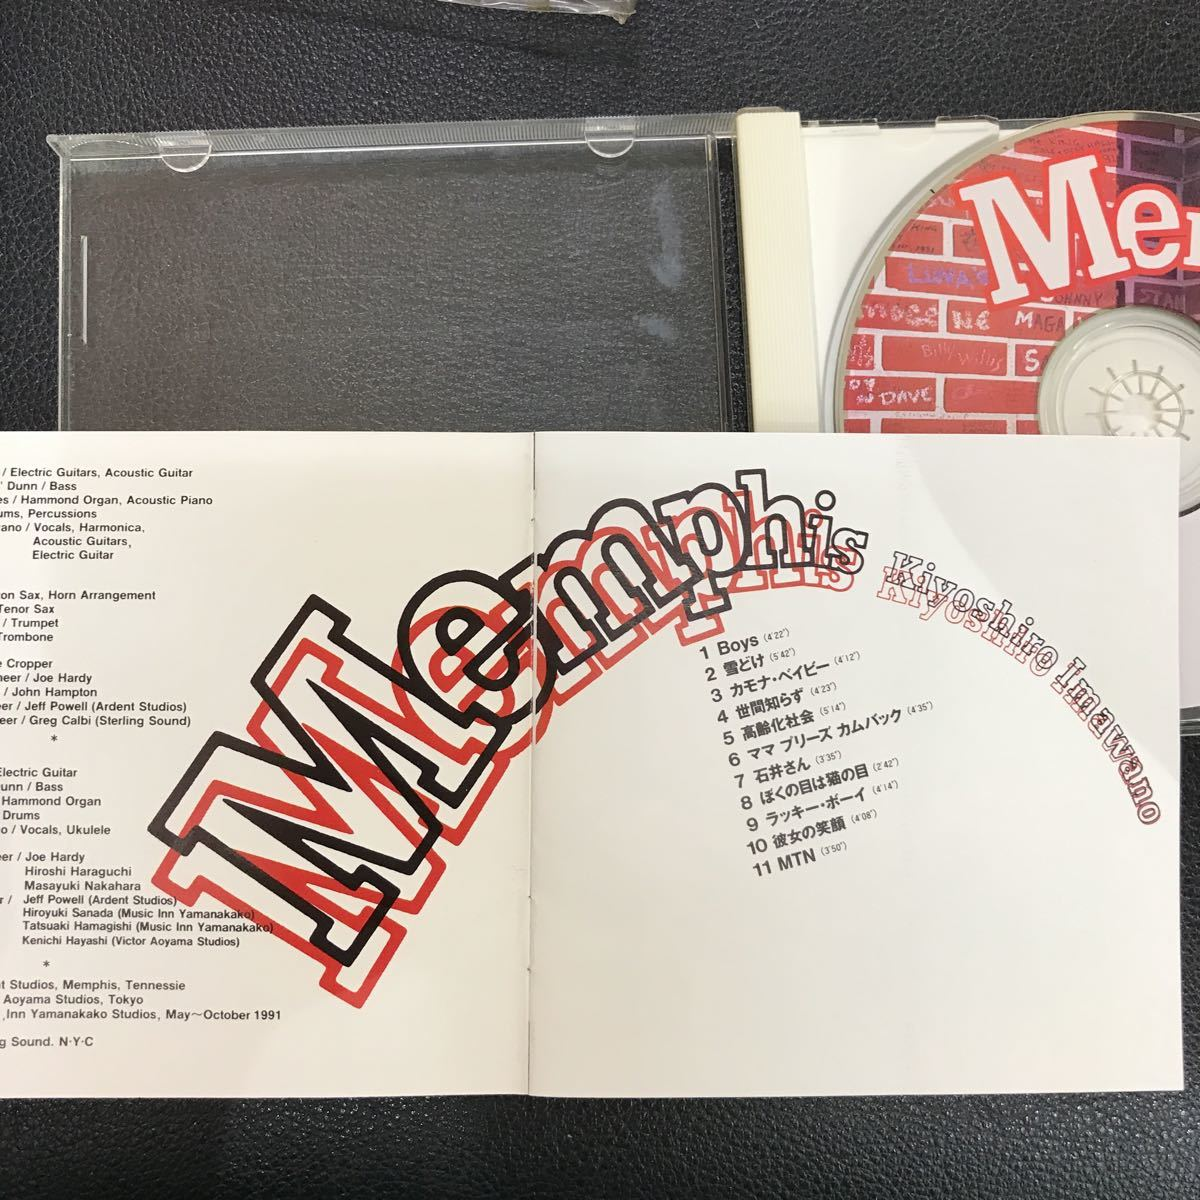 CD 中古☆【邦楽】忌野清志郎 メンフィス